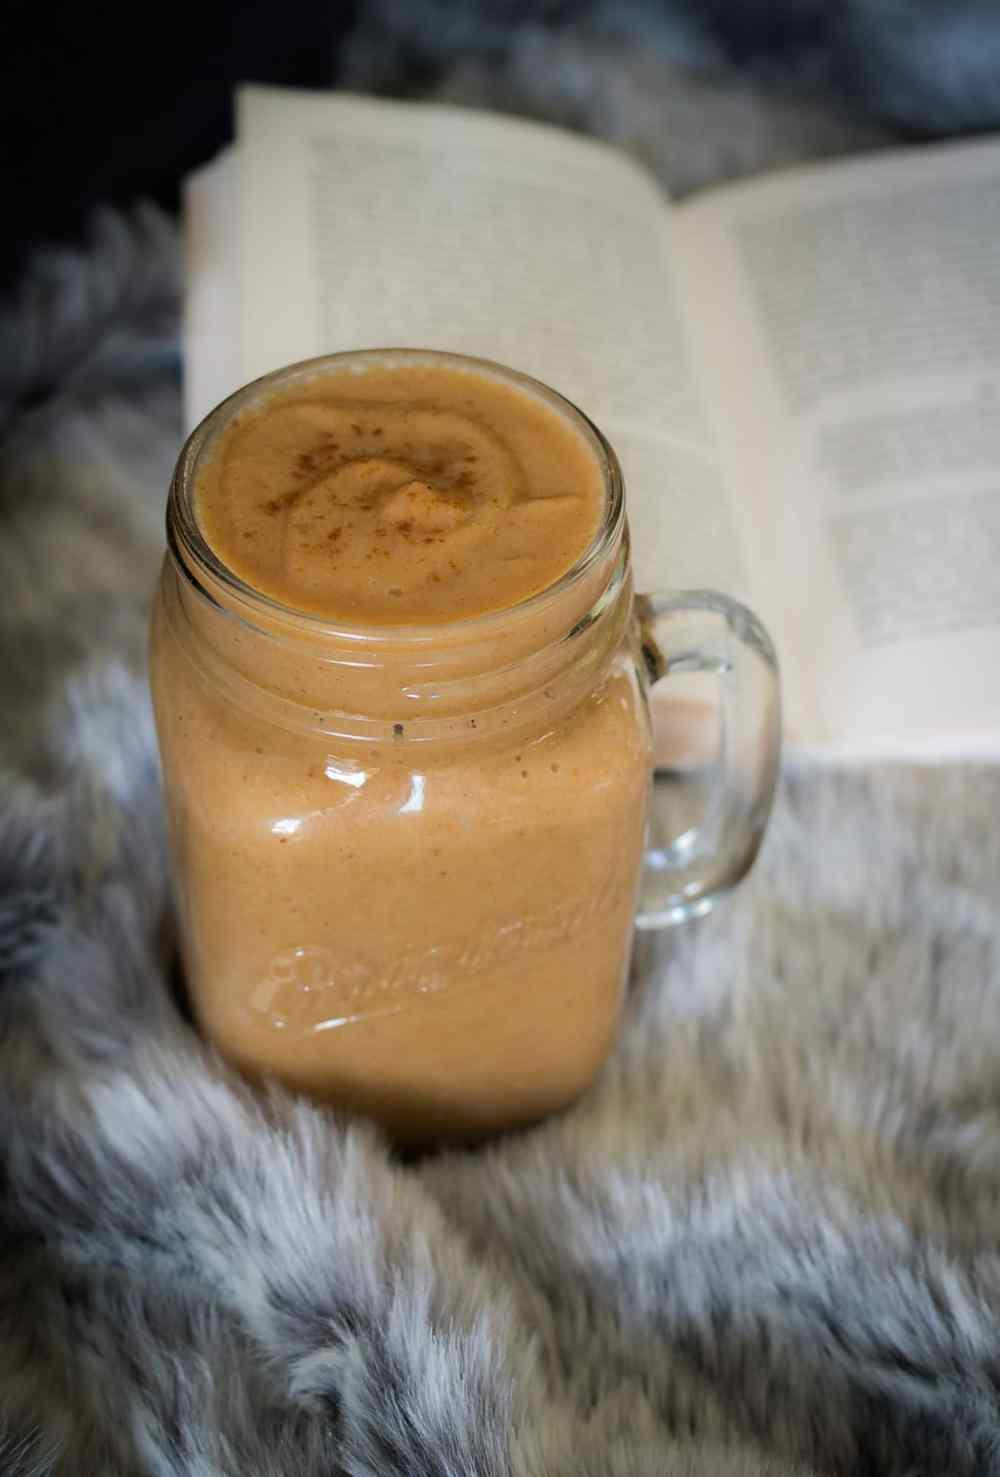 My secret addiction: warmer Apfelsmoothie.